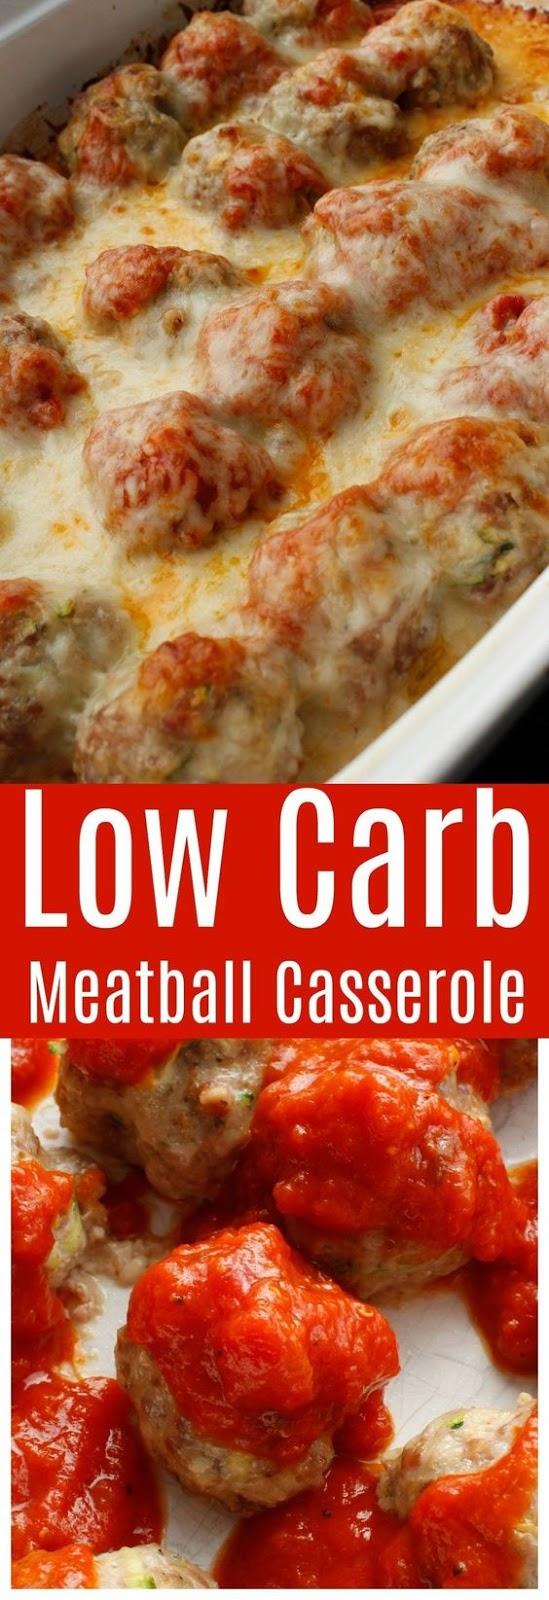 Low Carb Meatball Casserole Recipes